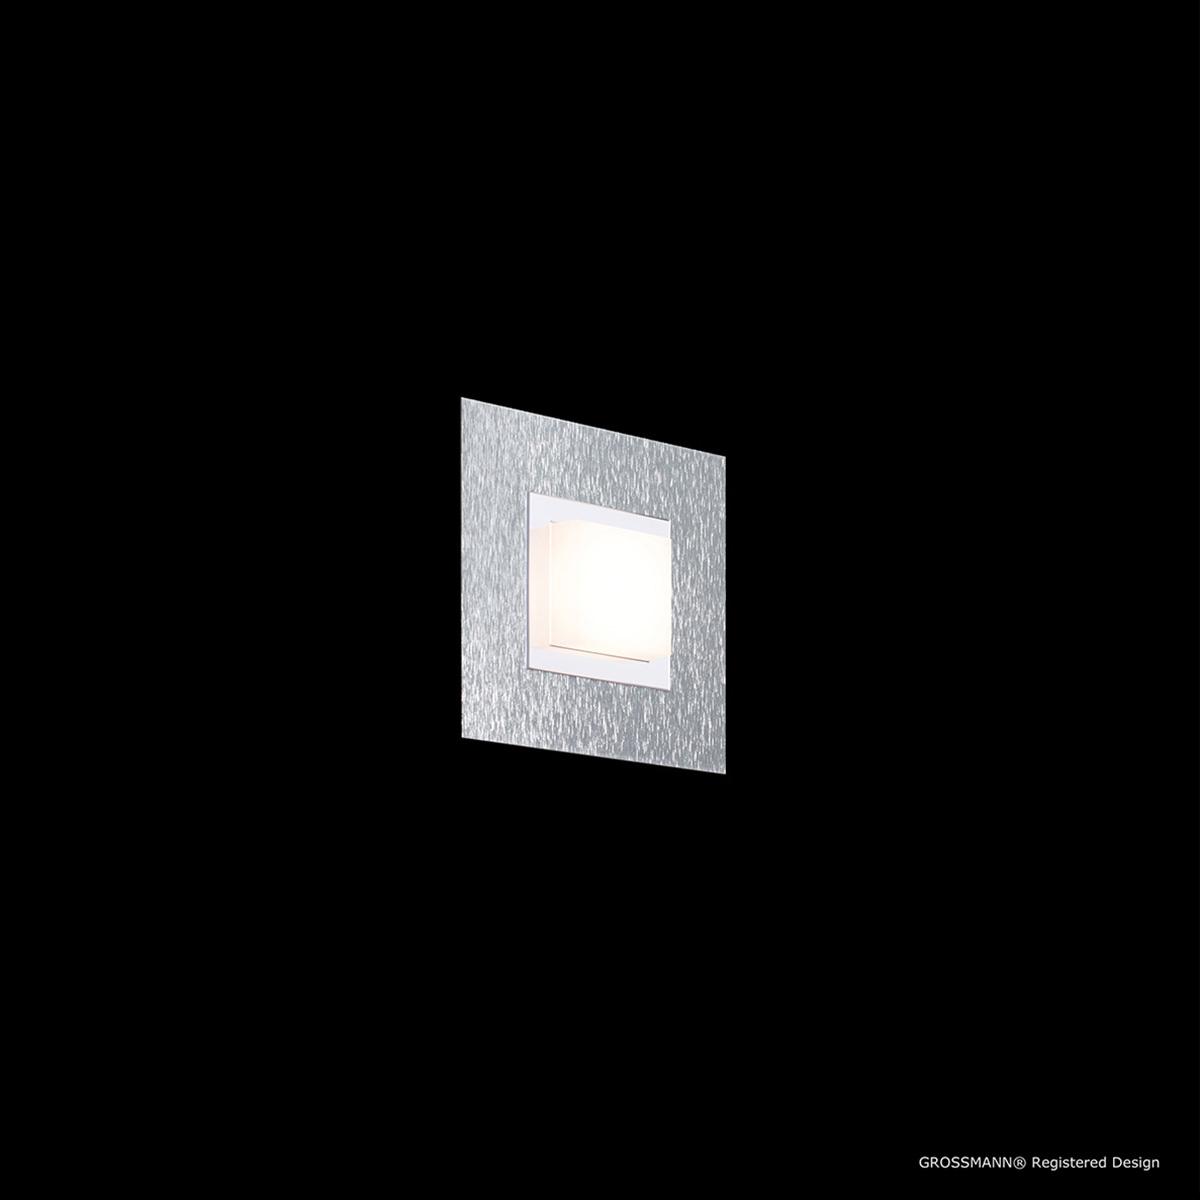 Grossmann Basic LED Wandleuchte 51-790-072